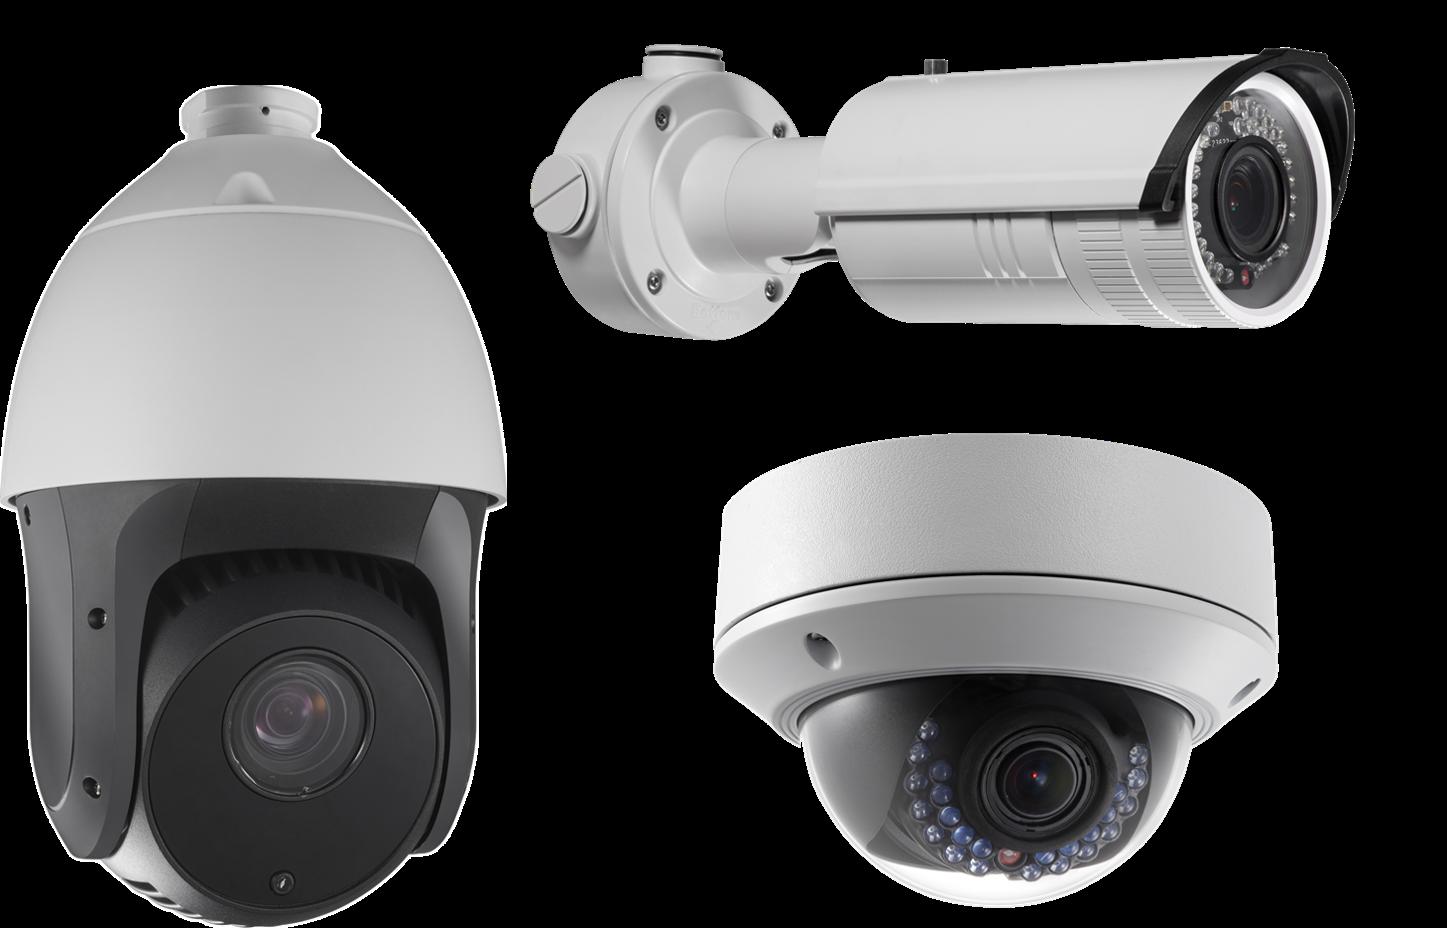 ClareVision Plus Varifocal Lens Cameras